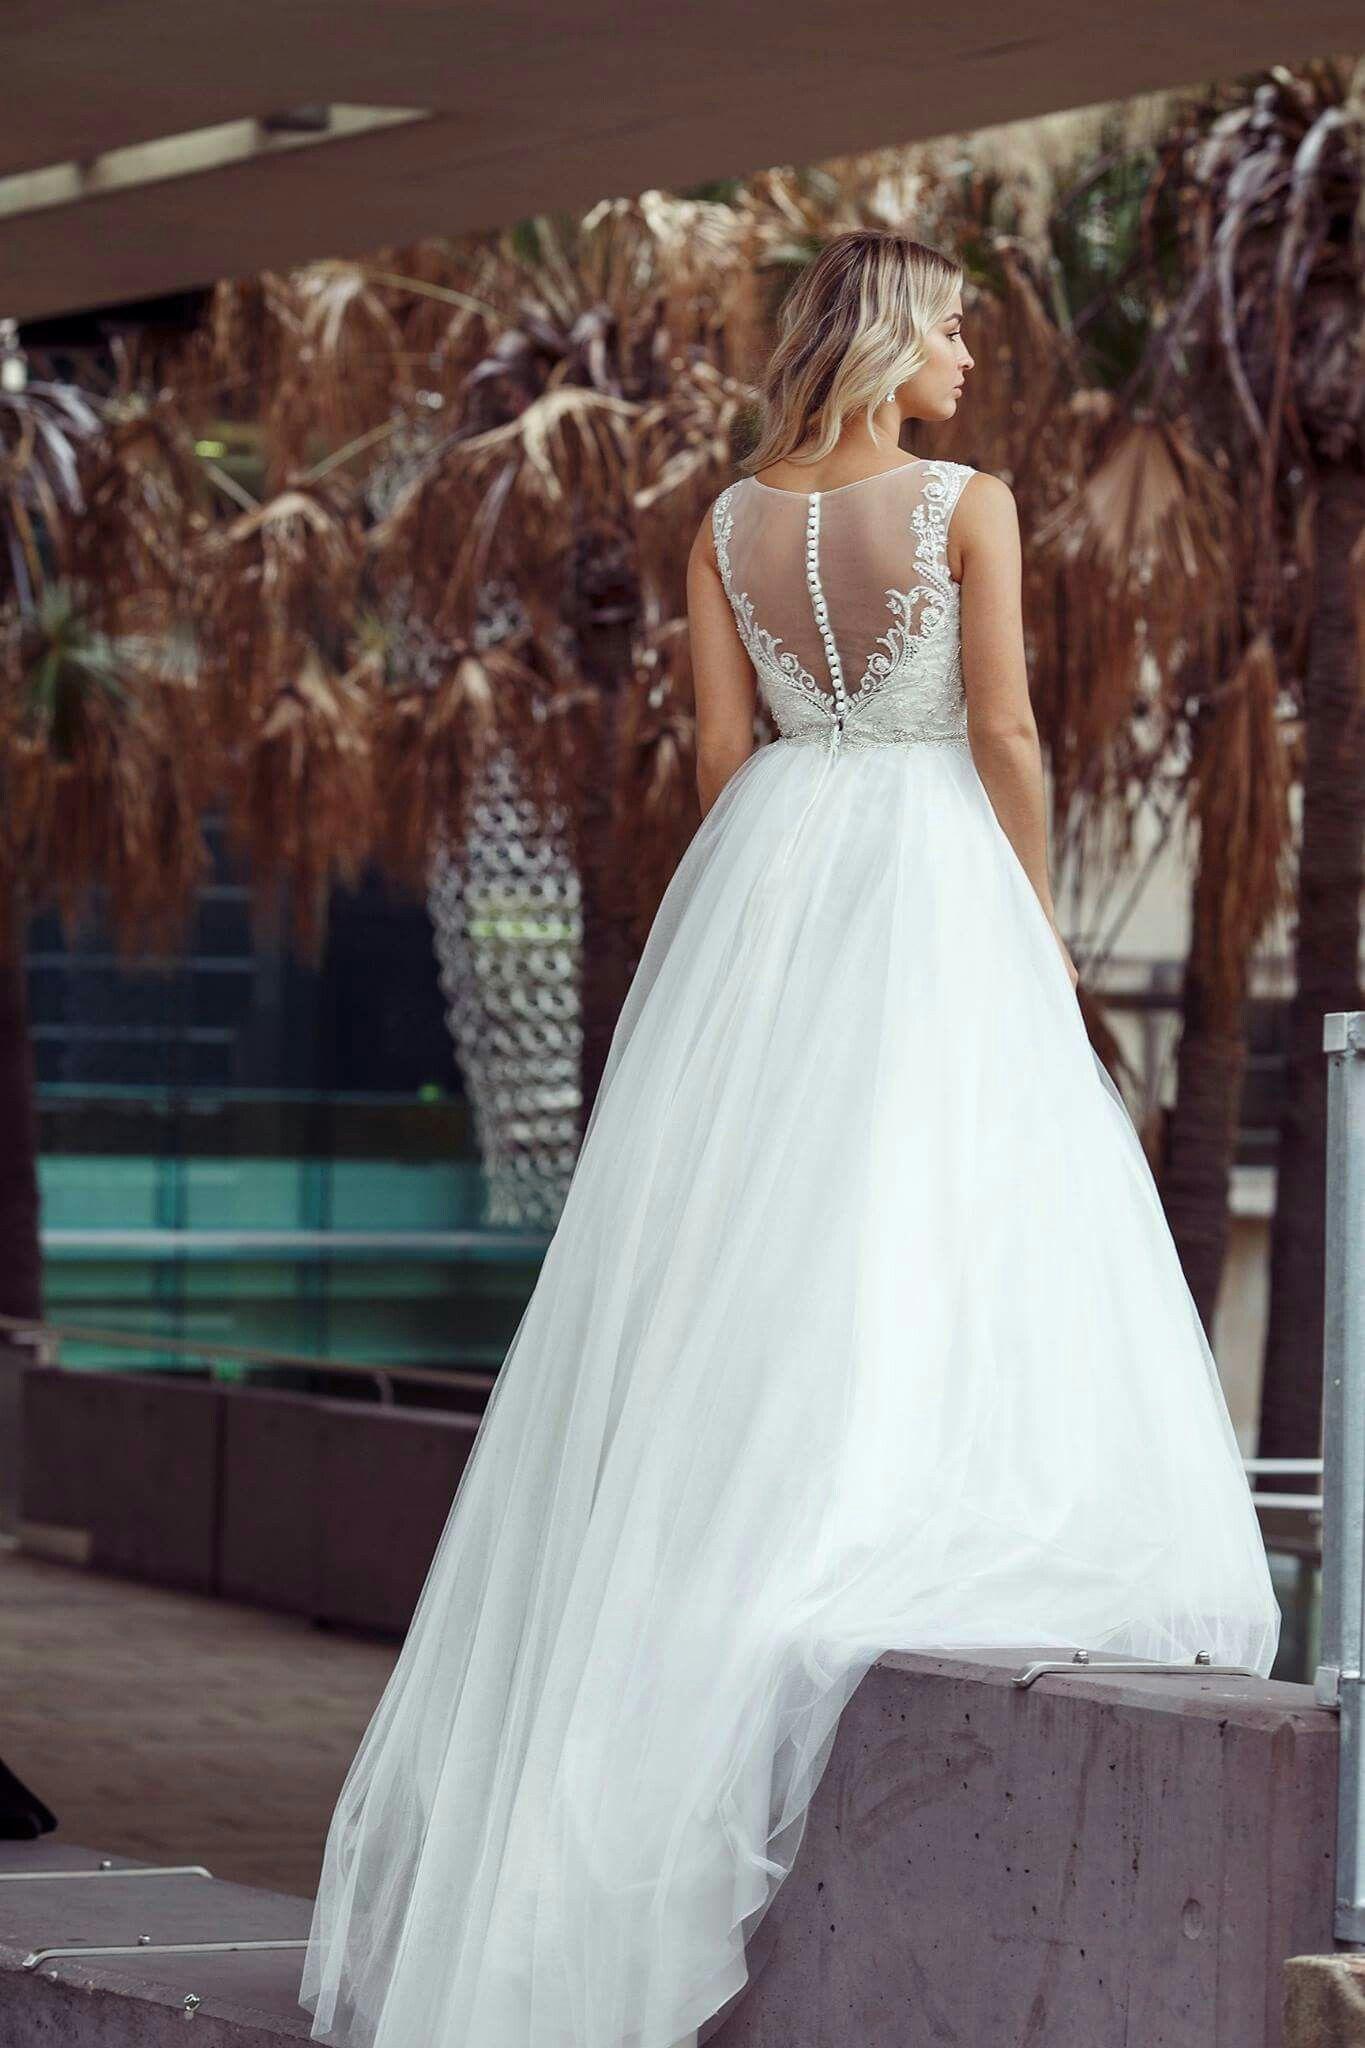 Pin by Daniela Pavlovska on Wedding Dresses | Pinterest | Wedding ...